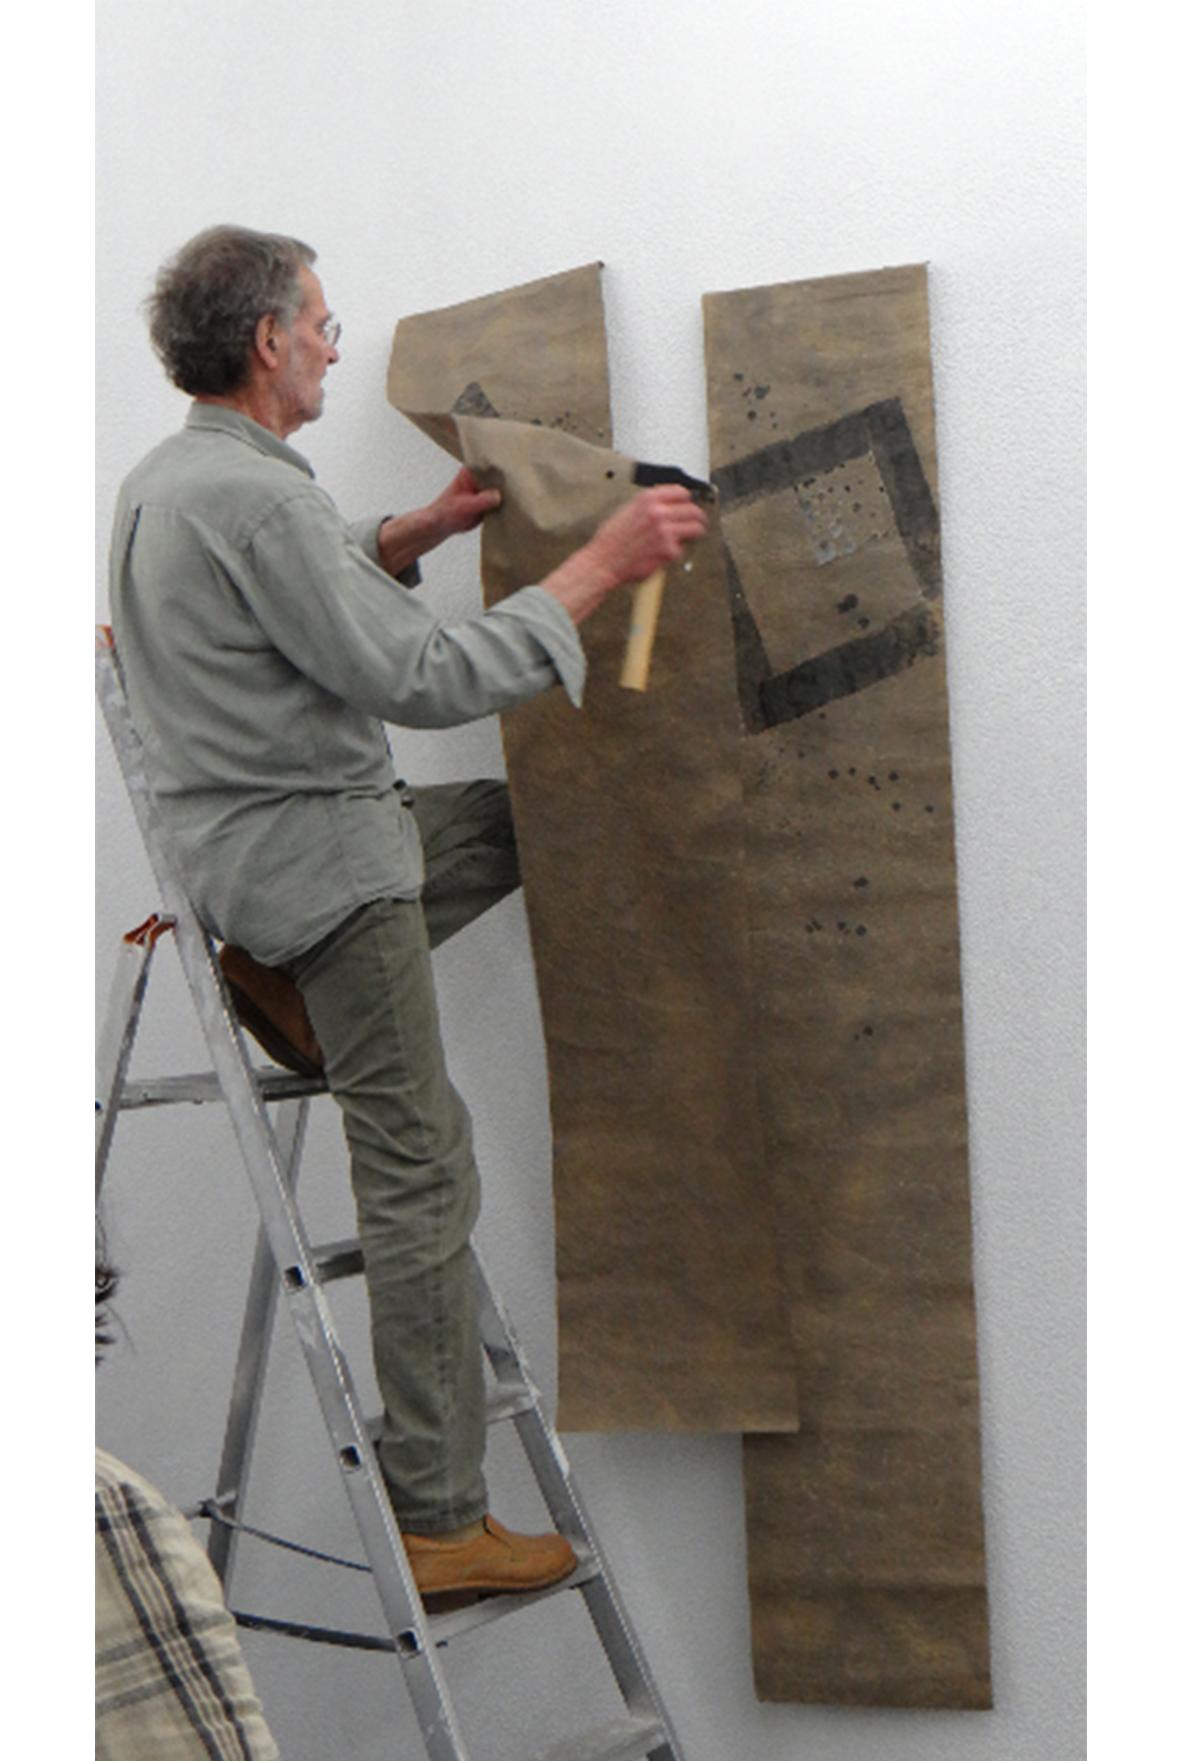 exposition Marcel Robelin 2013, galerie d'art lyon, art contemporain lyon, galerie Lyon